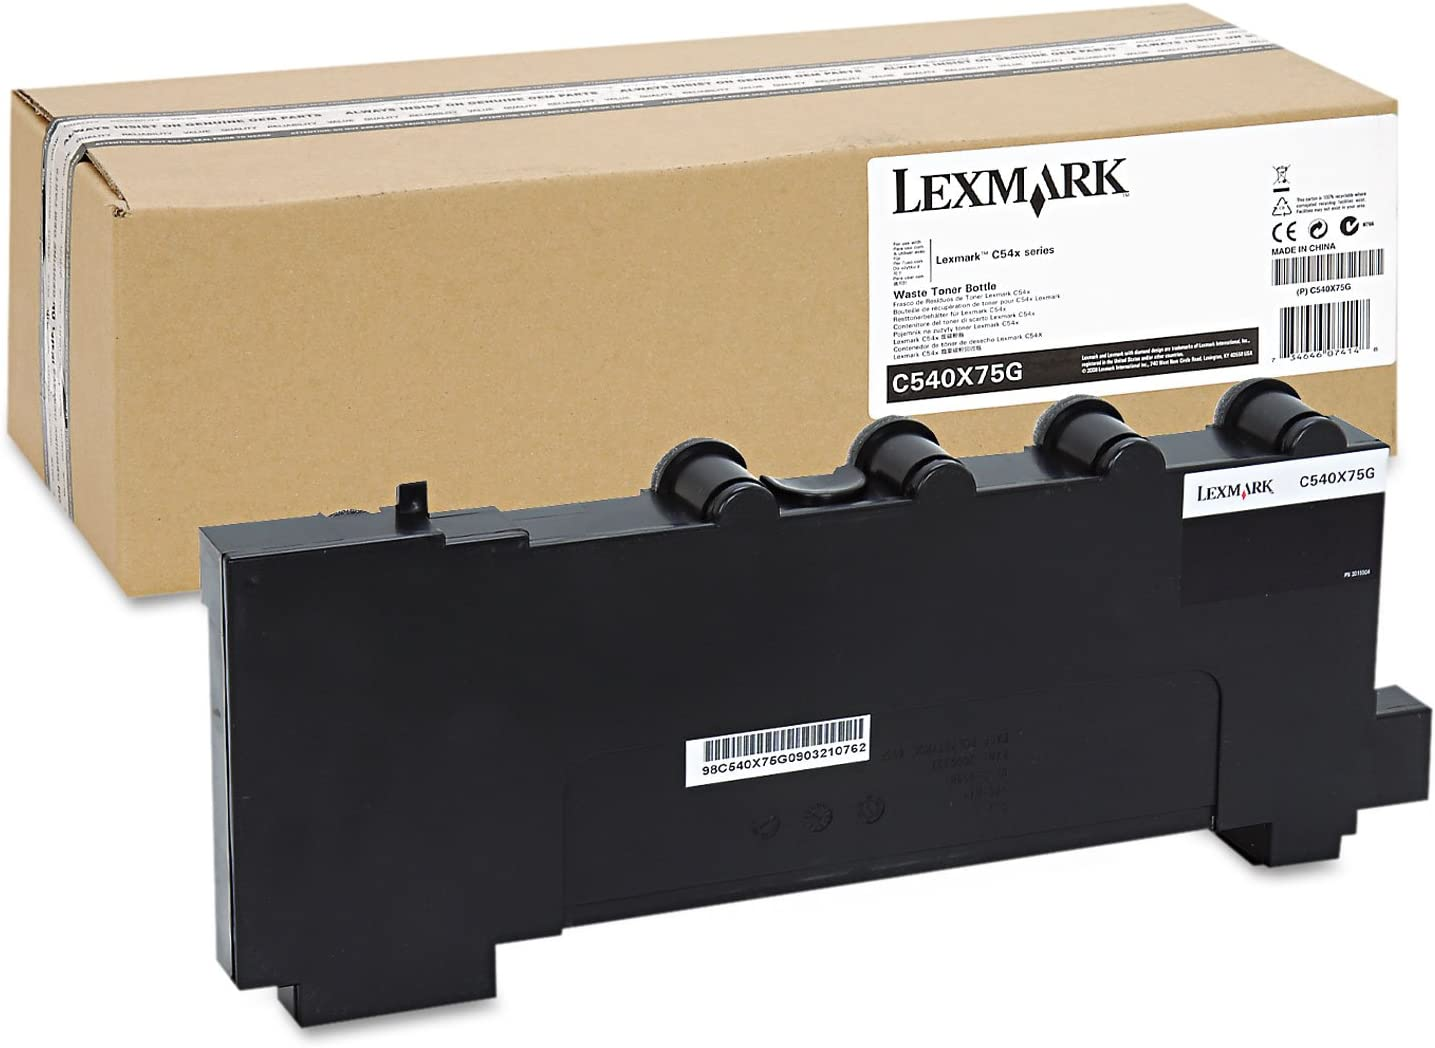 C543 X543 C544 X544 Waste Toner Bottle for Lexmark C540 DMi EA 36K Page Yield C540X75G Lexmark